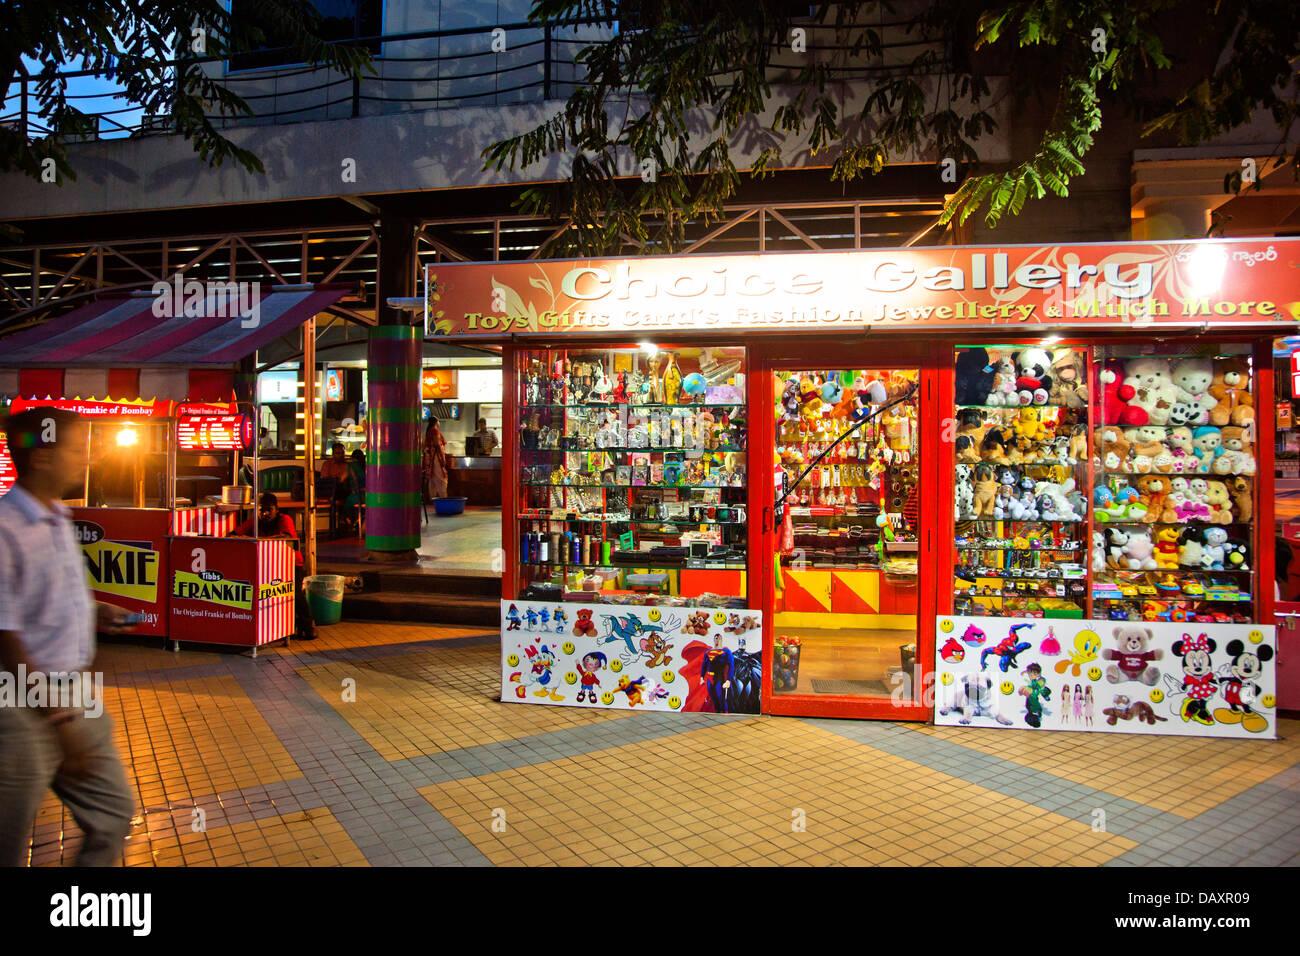 Toys shop at tourist place, Eat Street, Hyderabad, Andhra Pradesh Stock Photo: 58366457 - Alamy